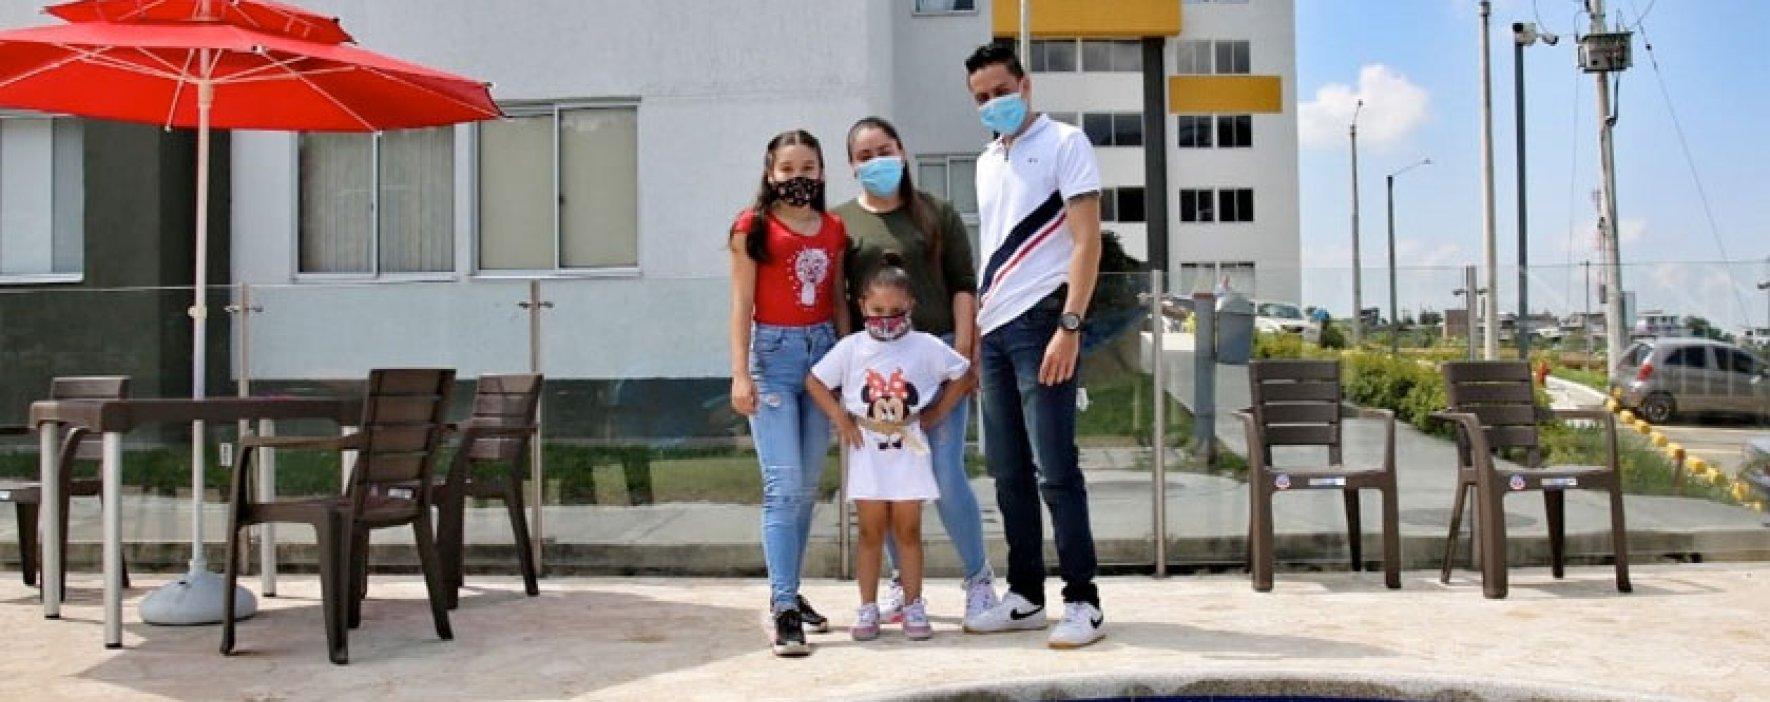 50 mil familias han estrenado vivienda propia en medio de la pandemia